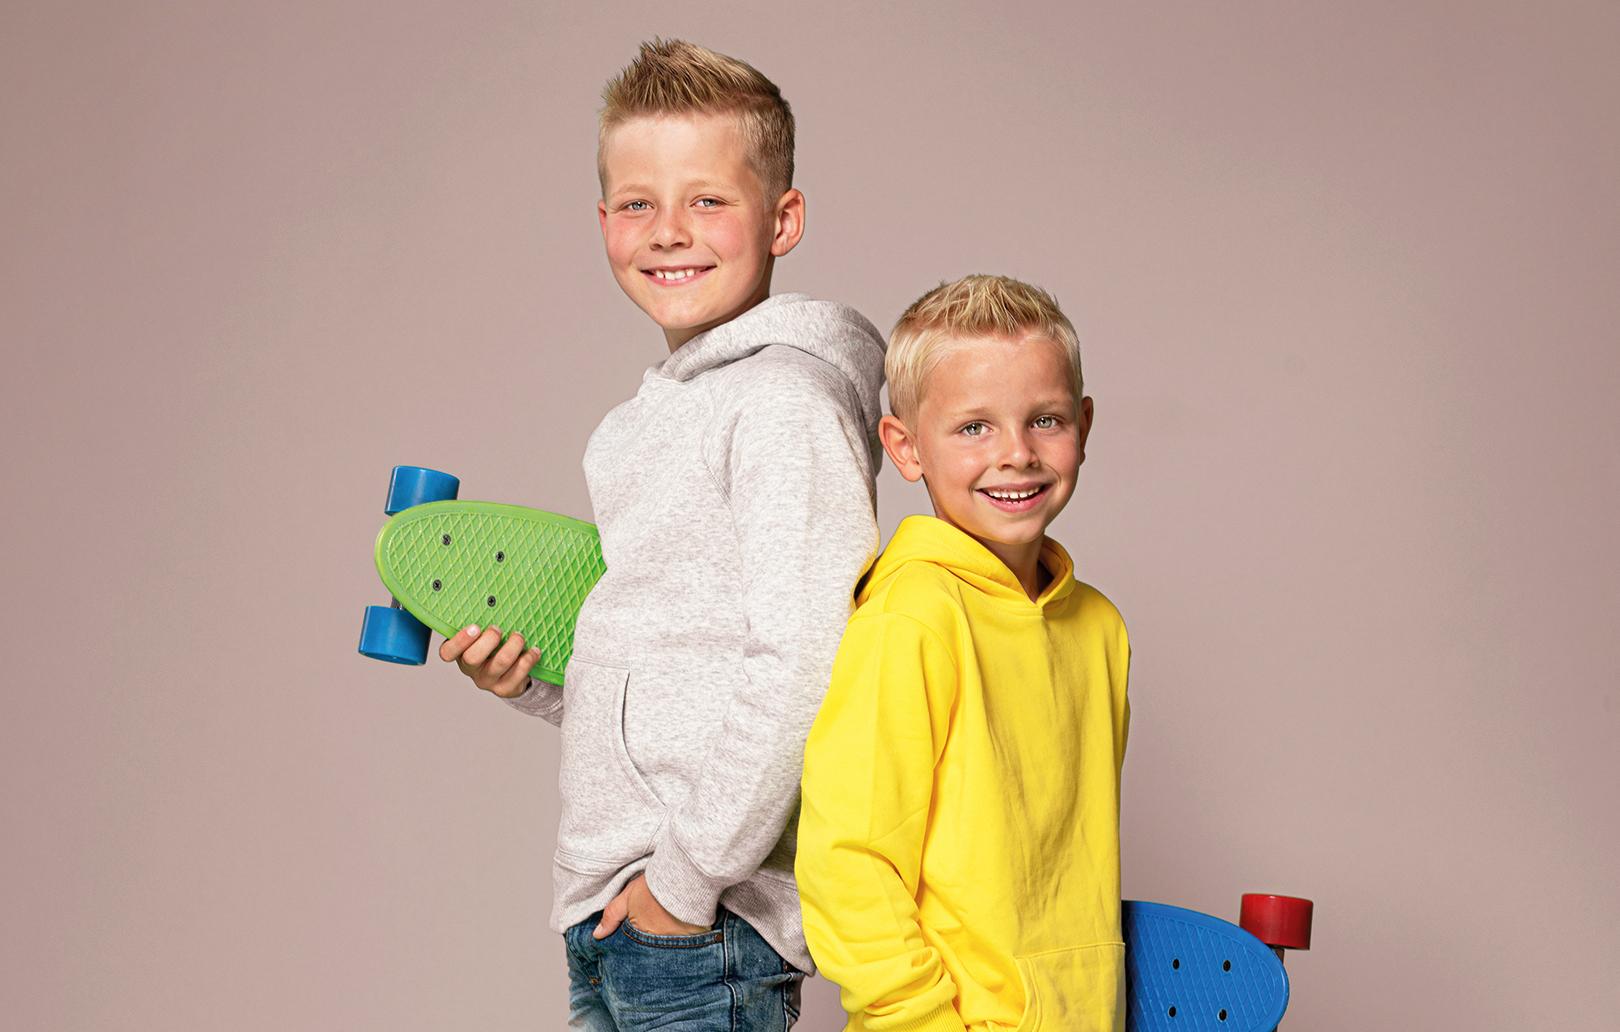 familien-fotoshooting-erfurt-bg41613382514